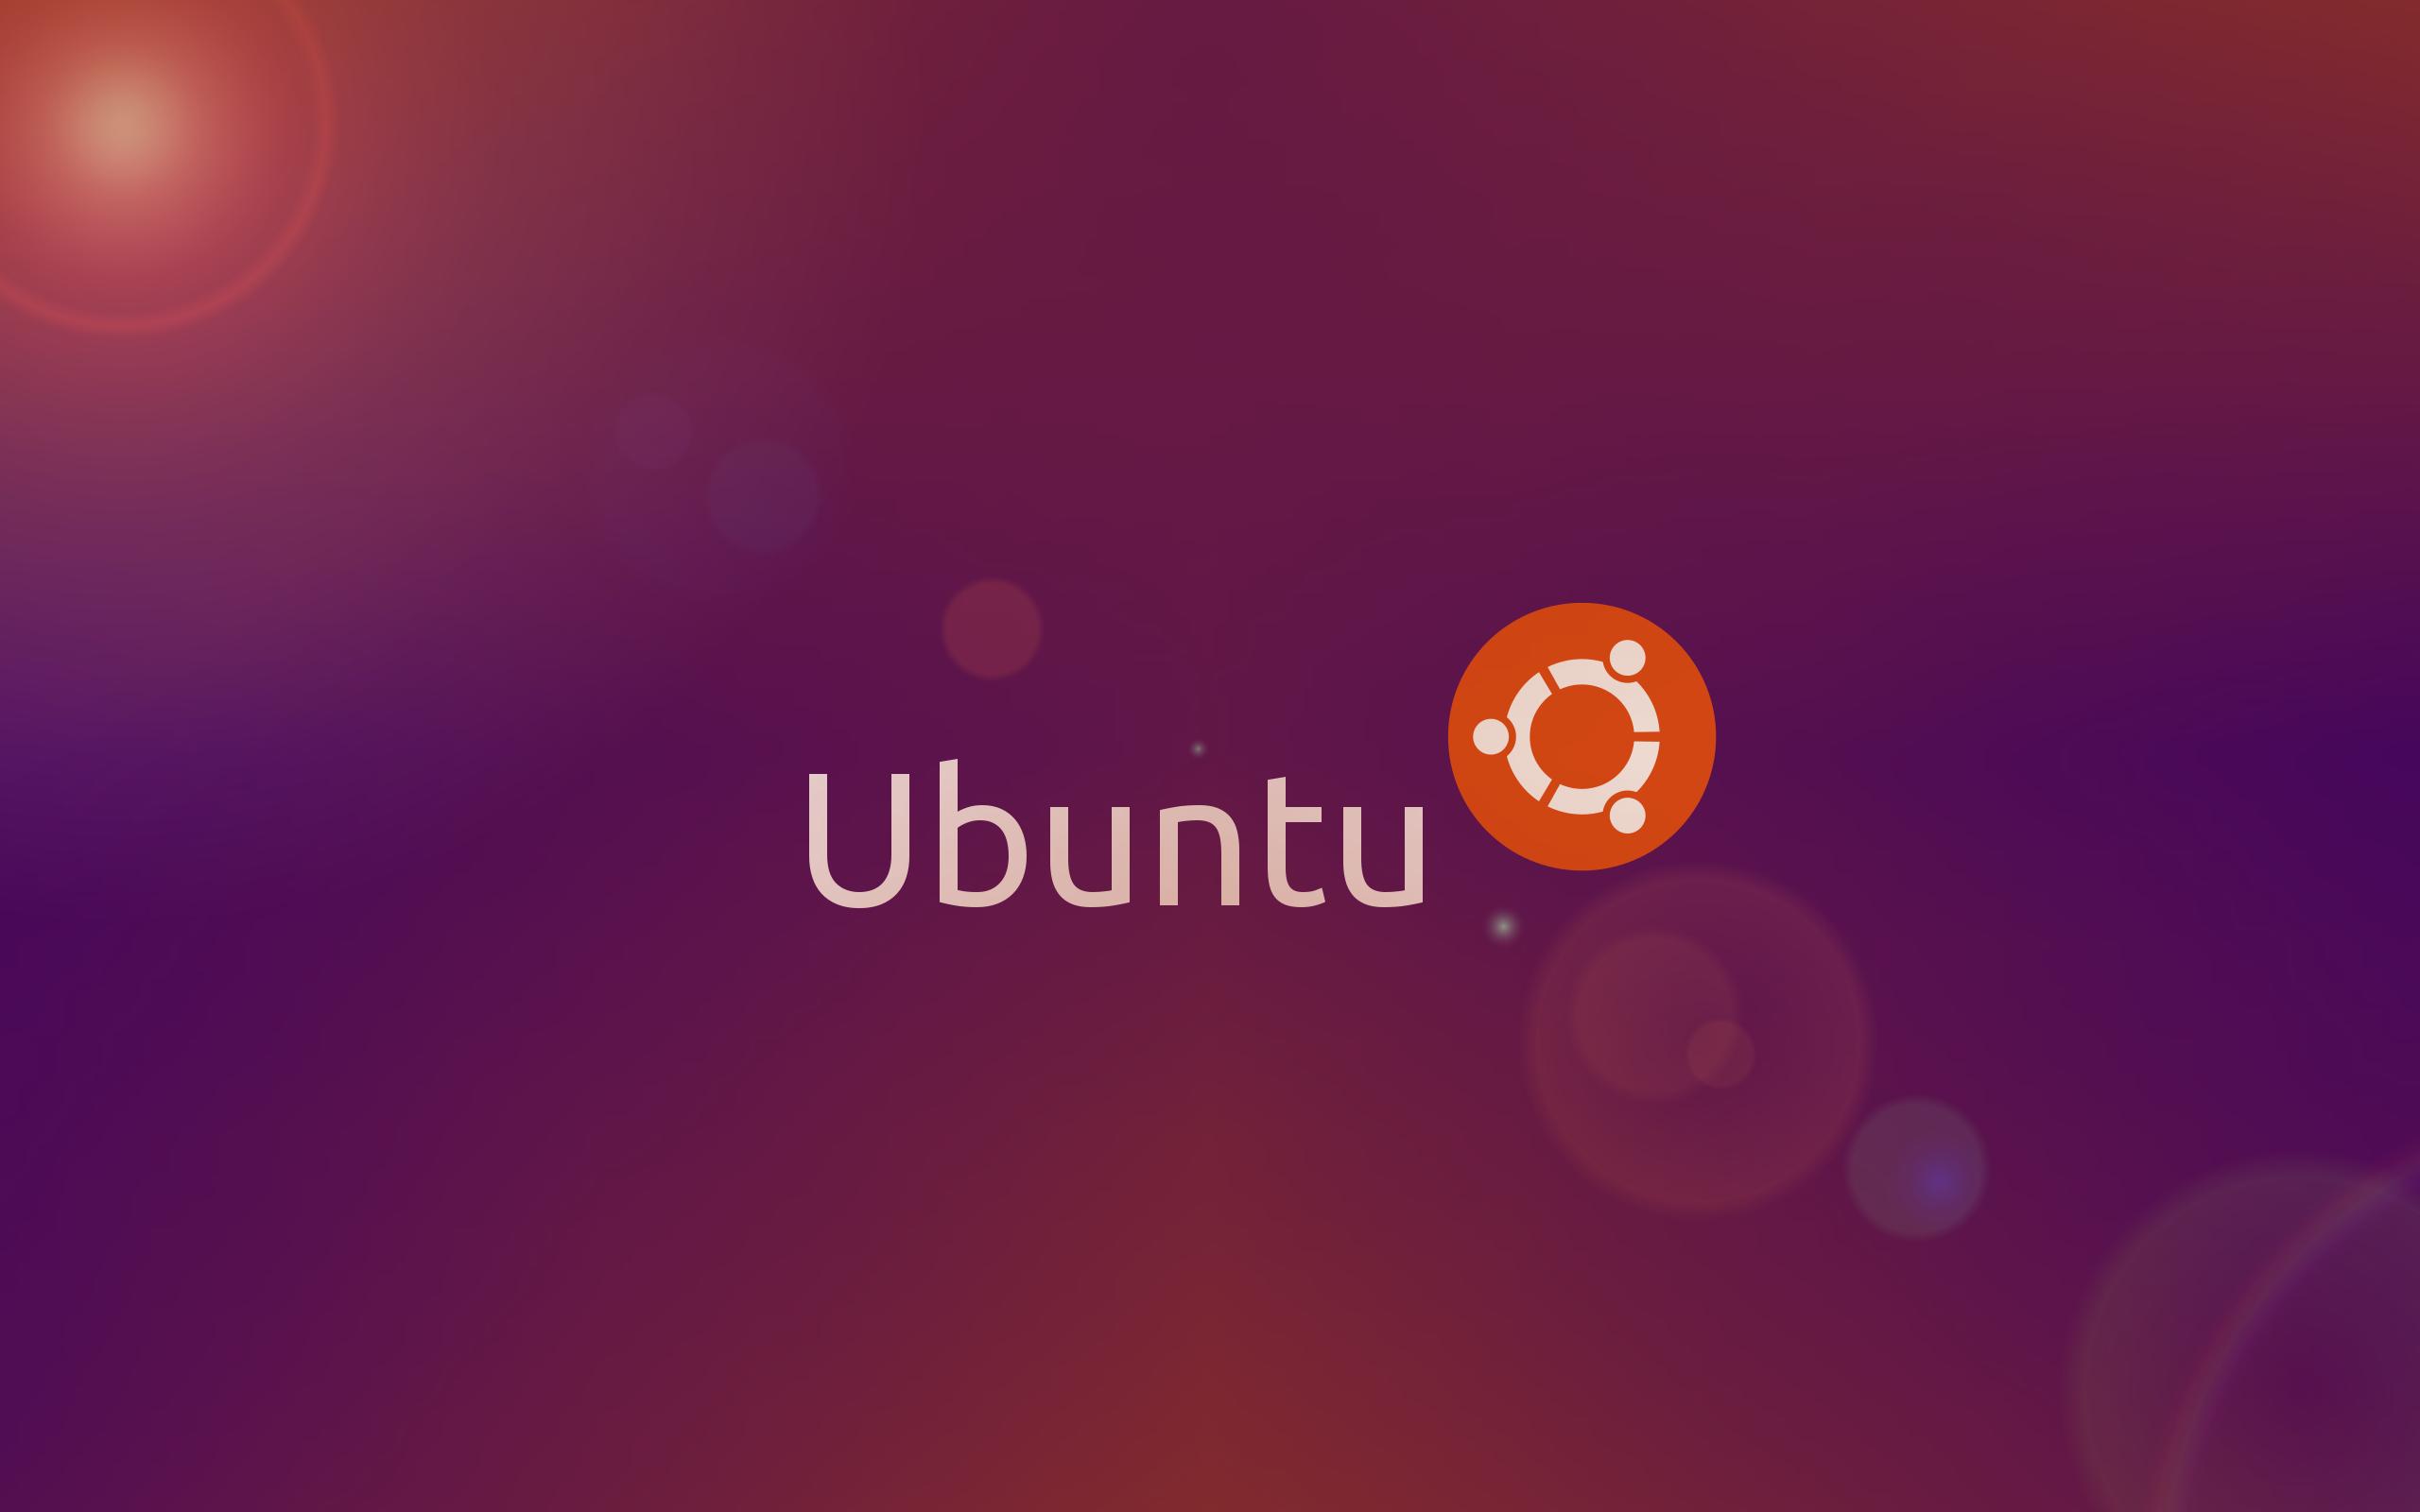 Ubuntu 25602151600 Wallpaper 2168134 2560x1600